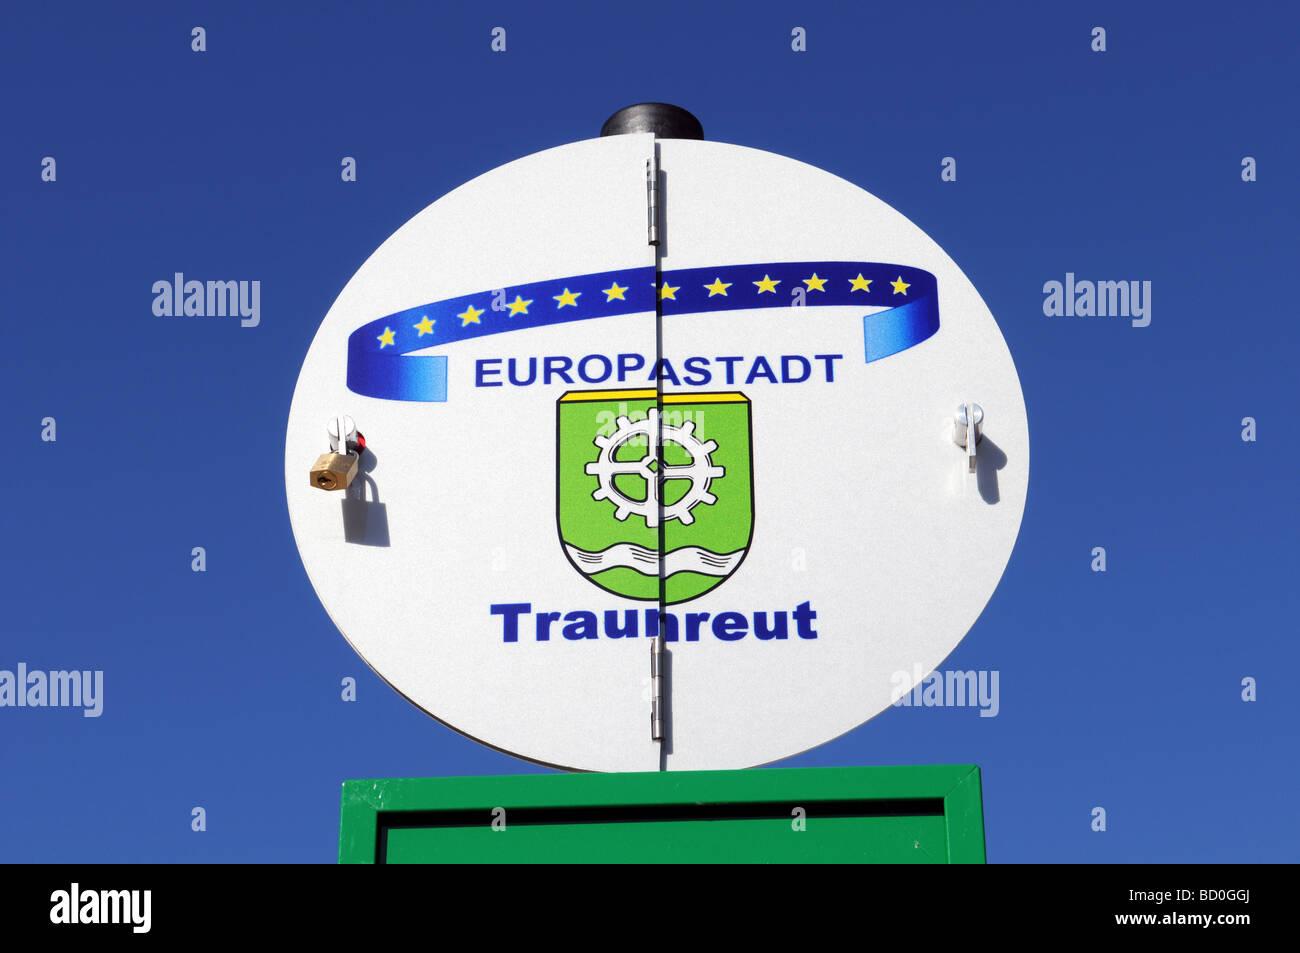 Traunreut Stock Photo